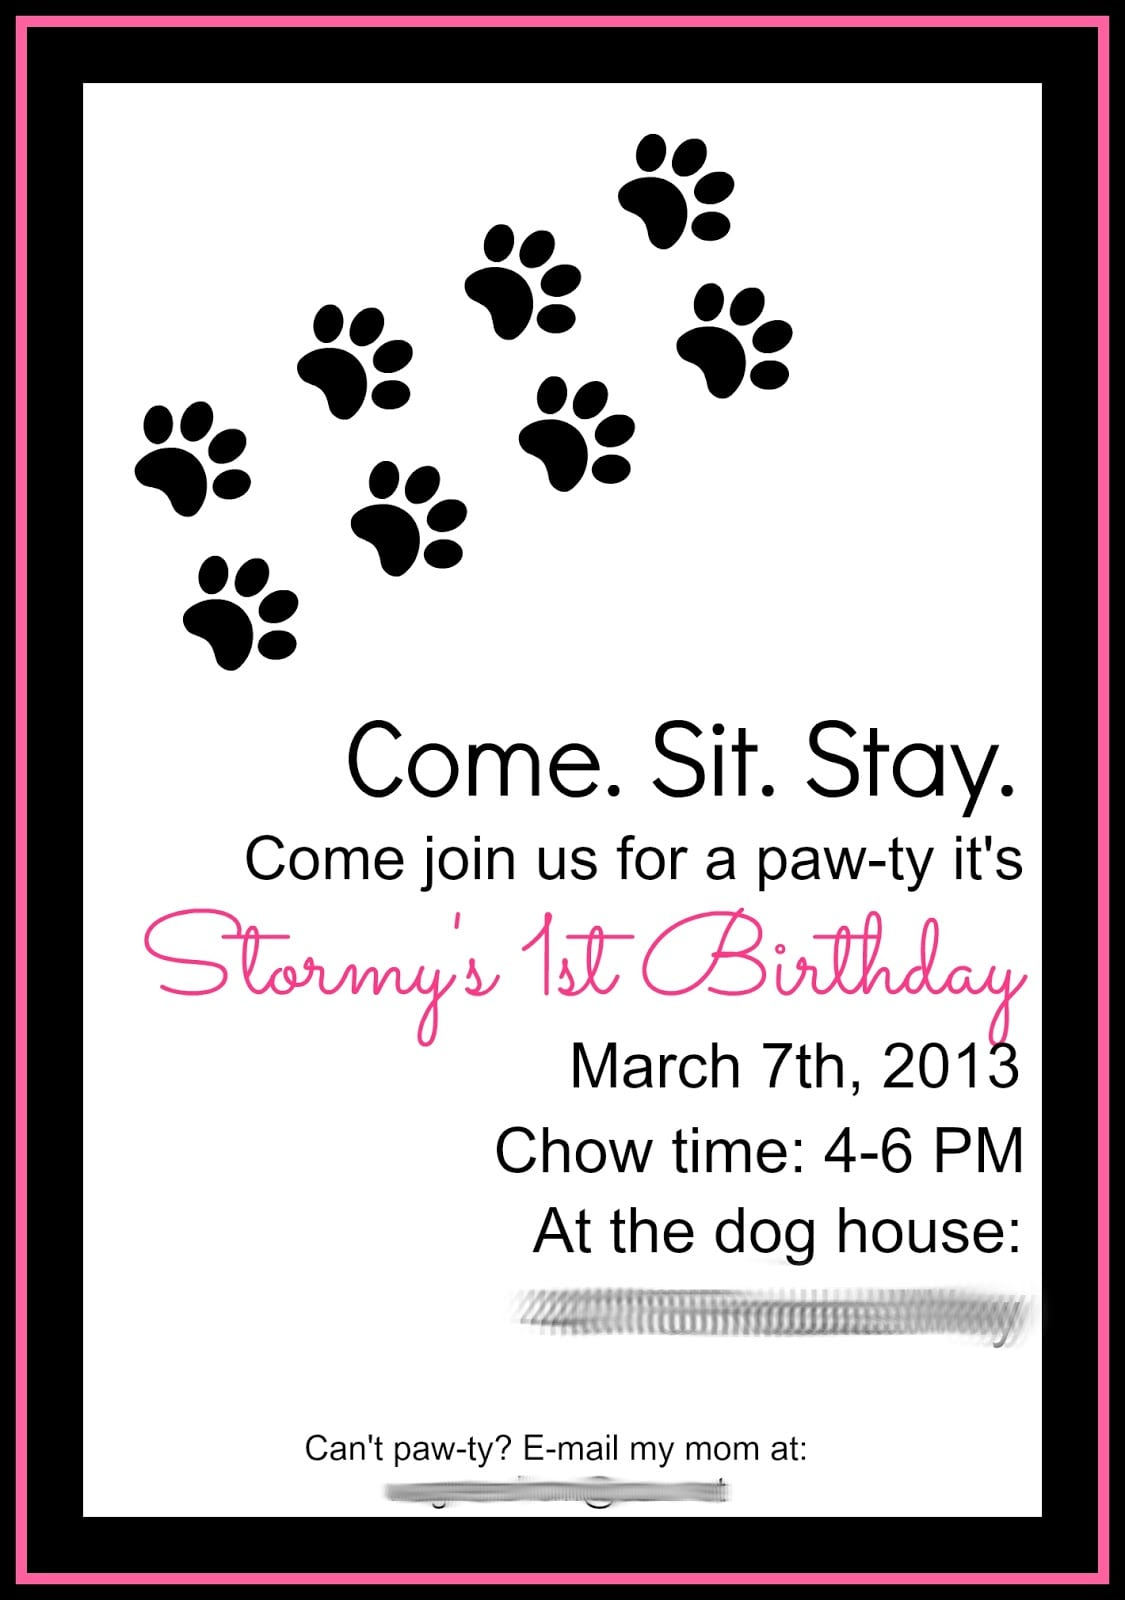 Dog Birthday Party Invitation Mickey Mouse Invitations Templates - Dog party invitations template